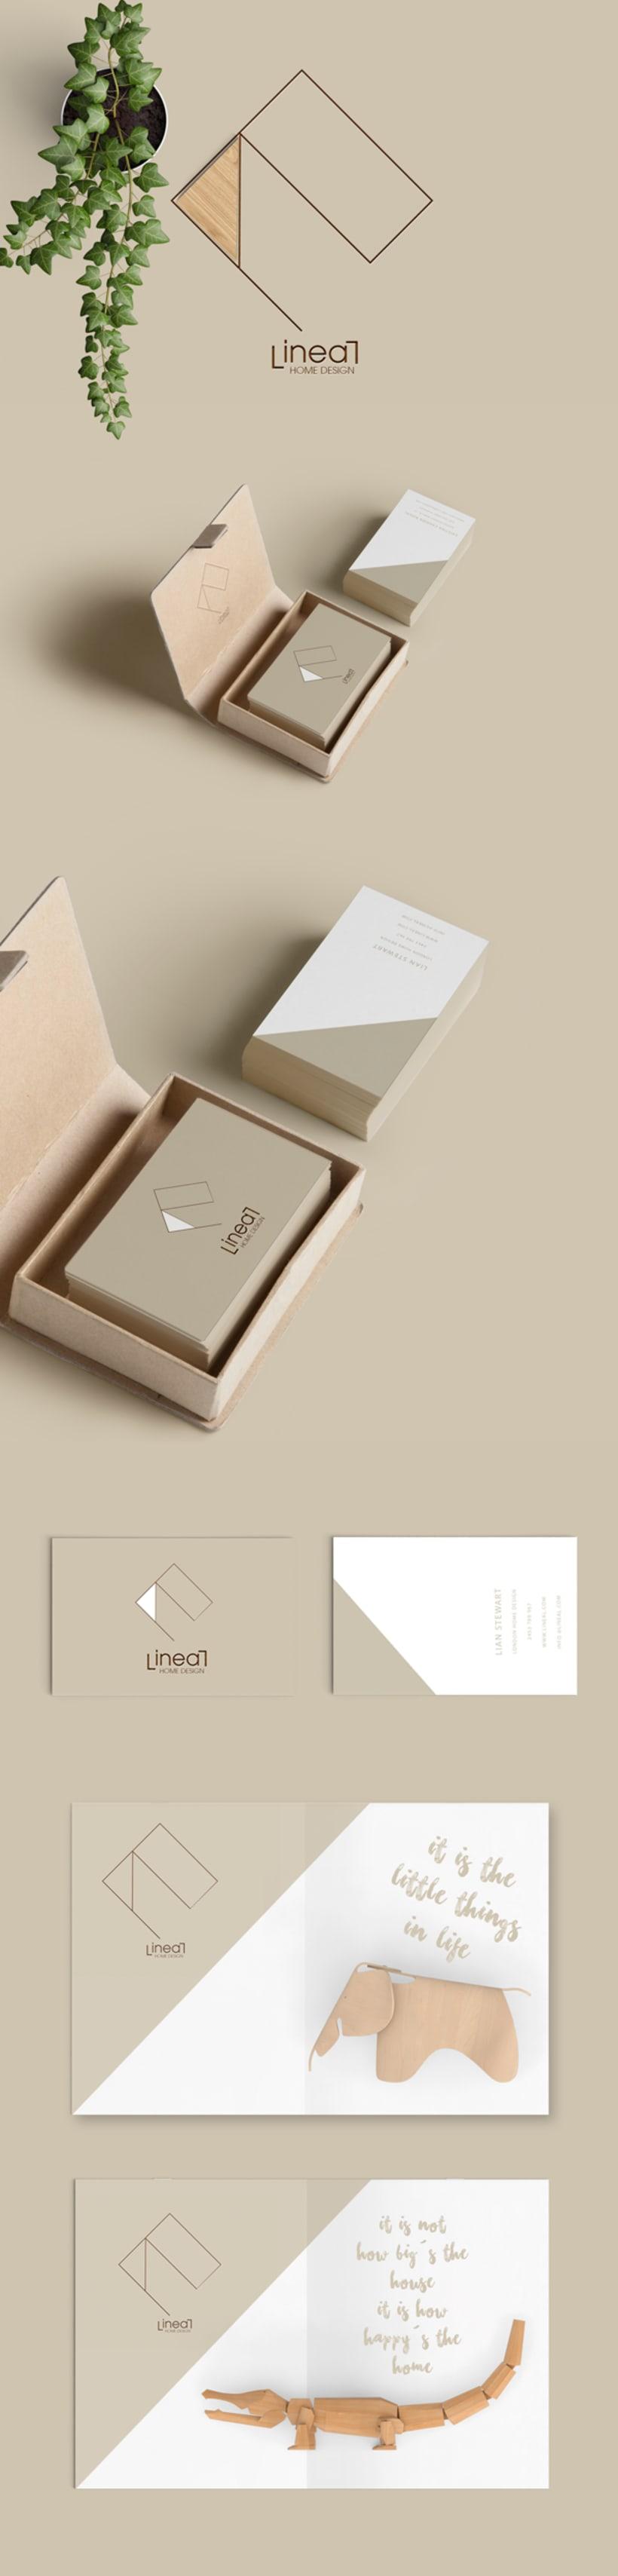 """Lineal"" home design. Identidad Corporativa -1"